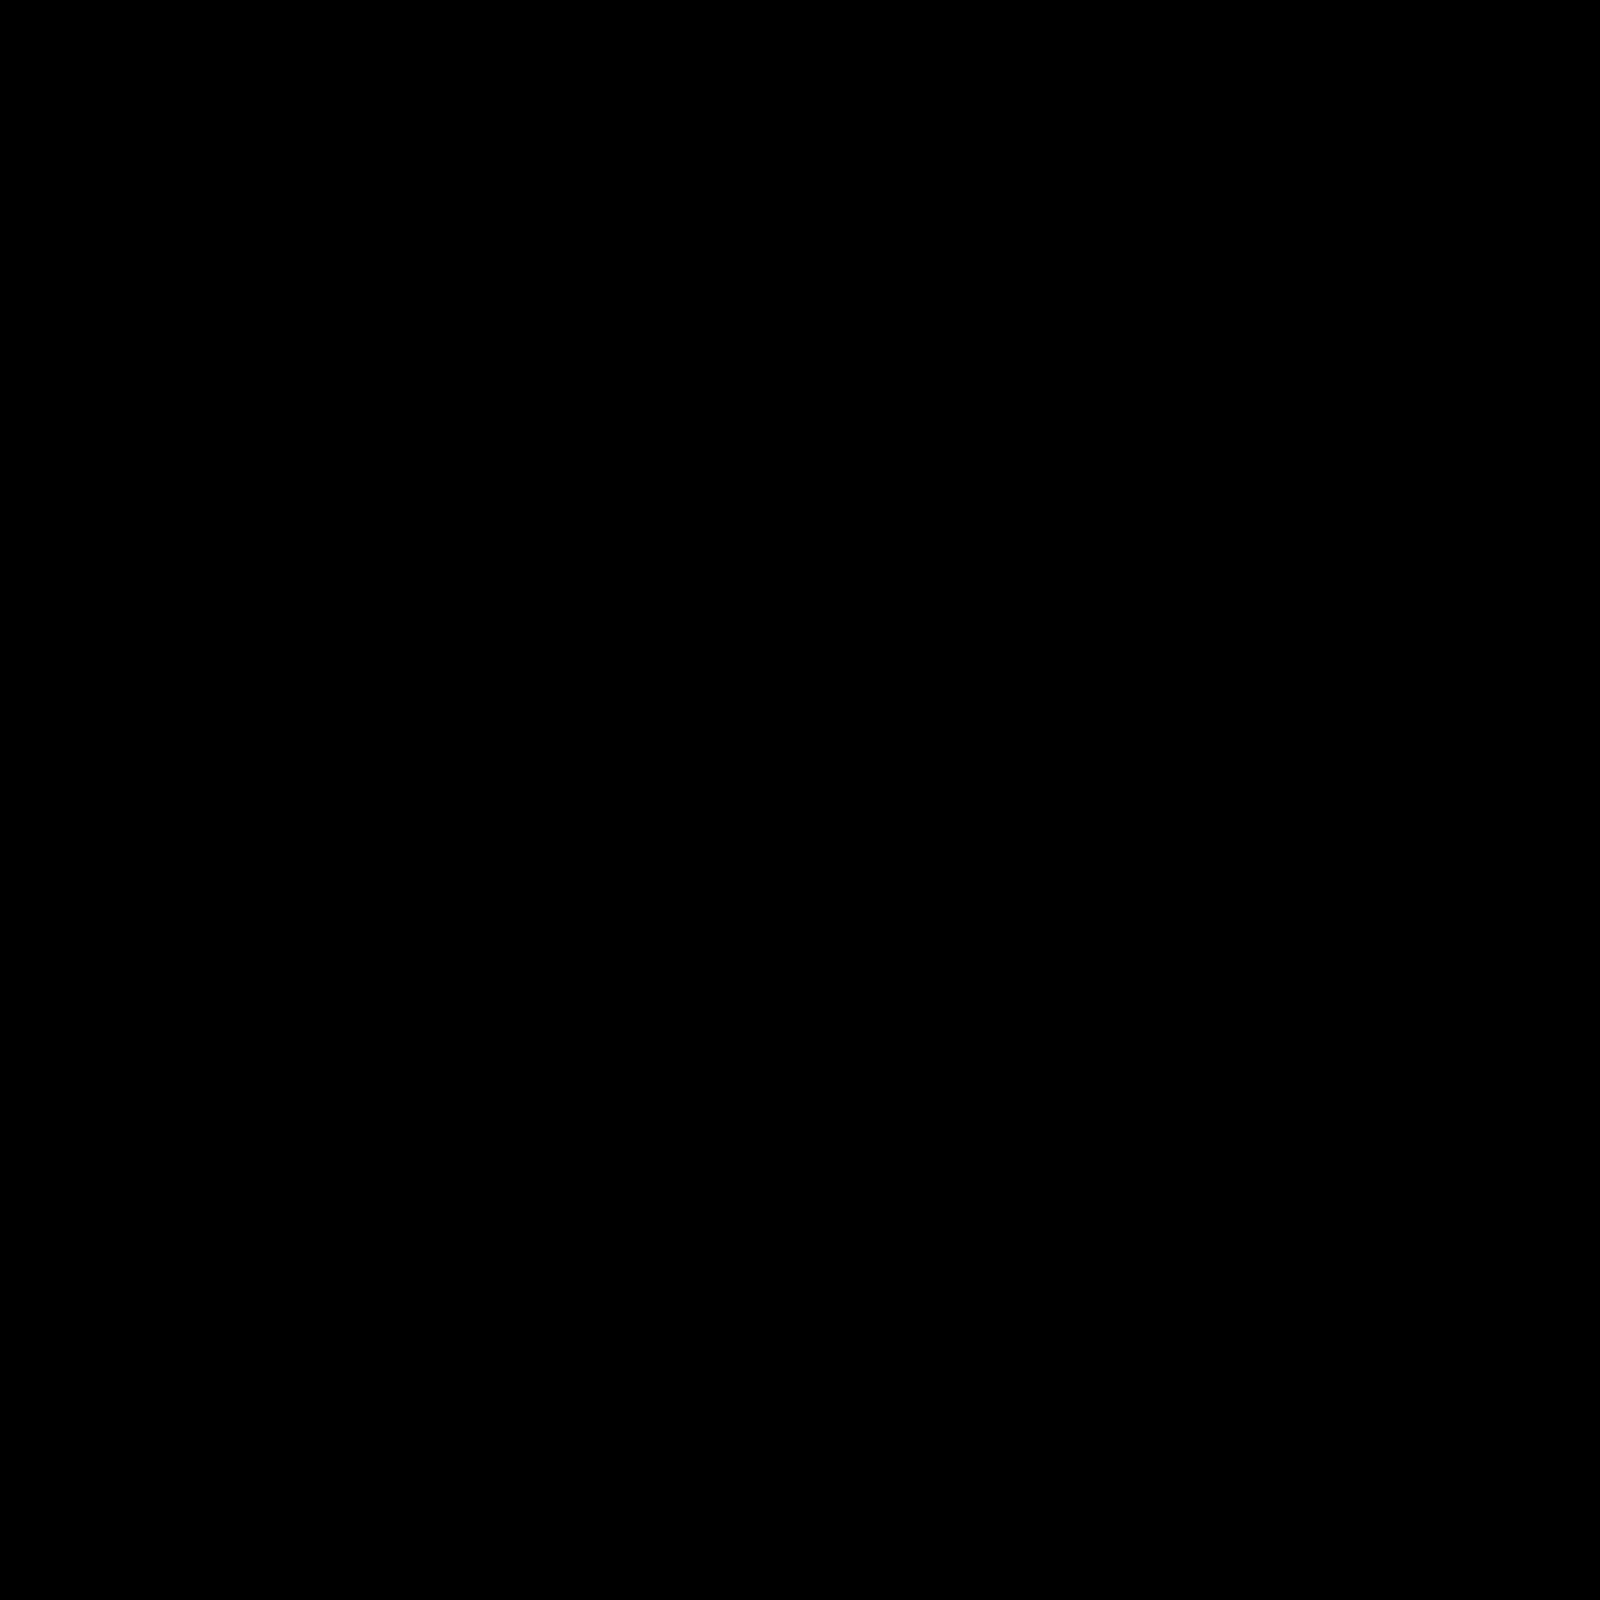 Japanese Bullet Train icon